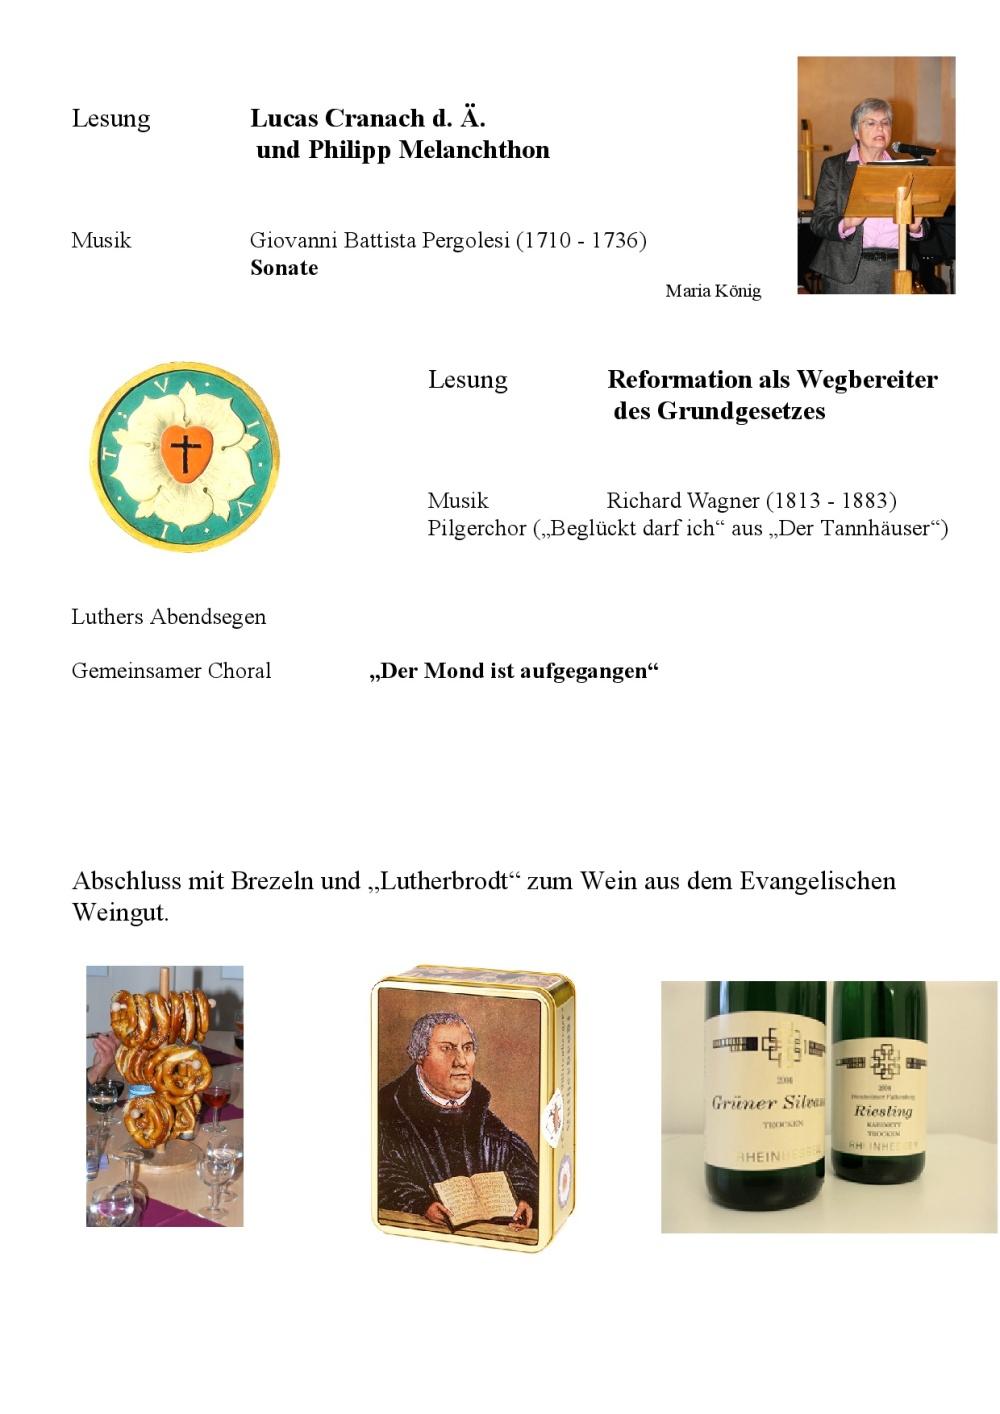 32-Reformationsfest 31.10.14-003